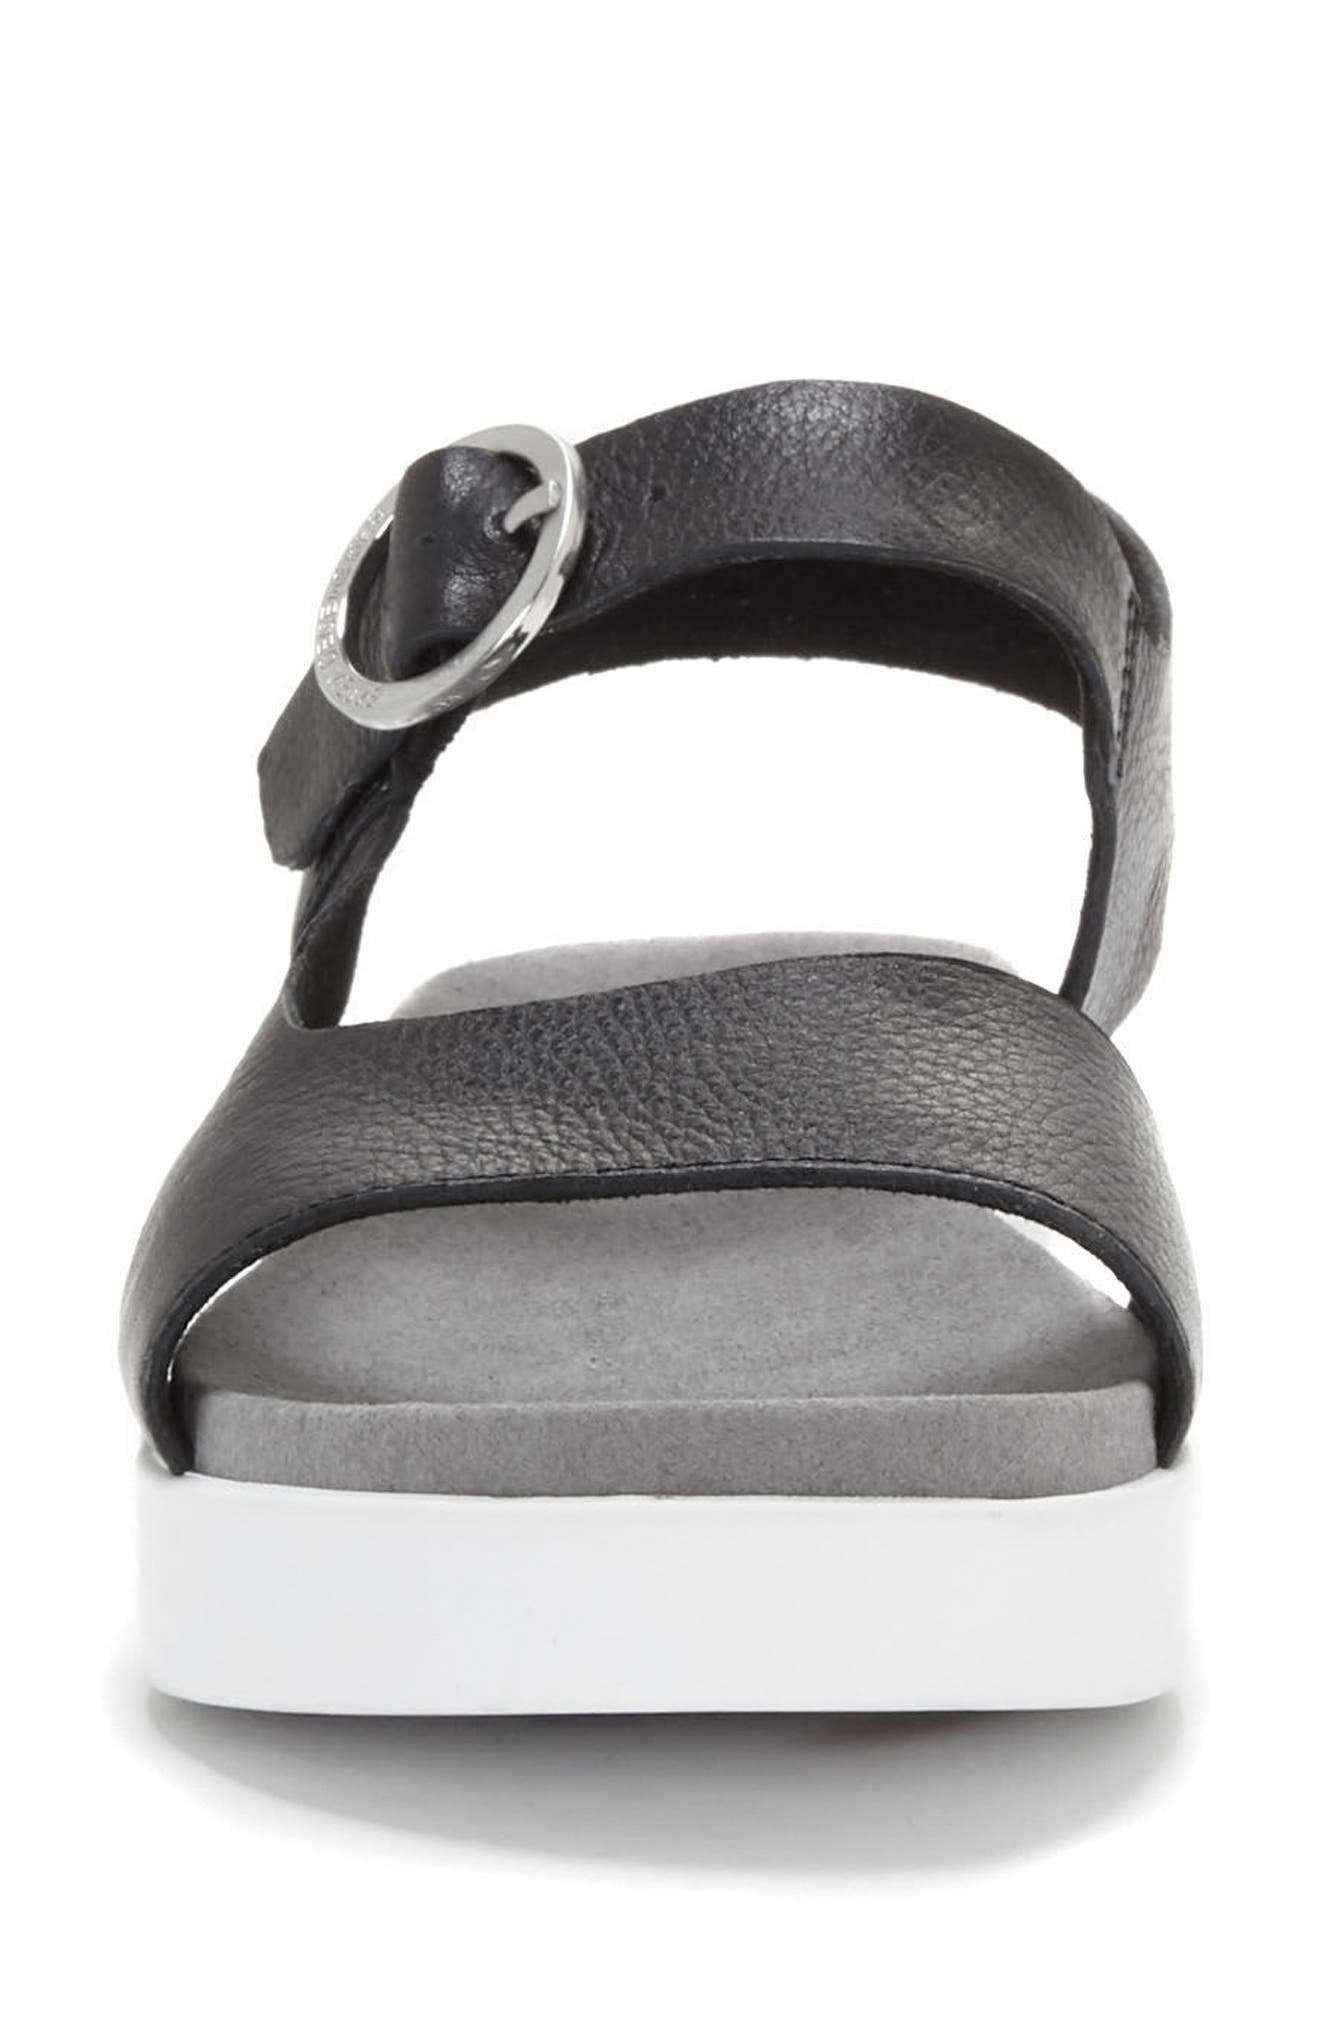 Caspin Sandal,                             Alternate thumbnail 3, color,                             Black Leather